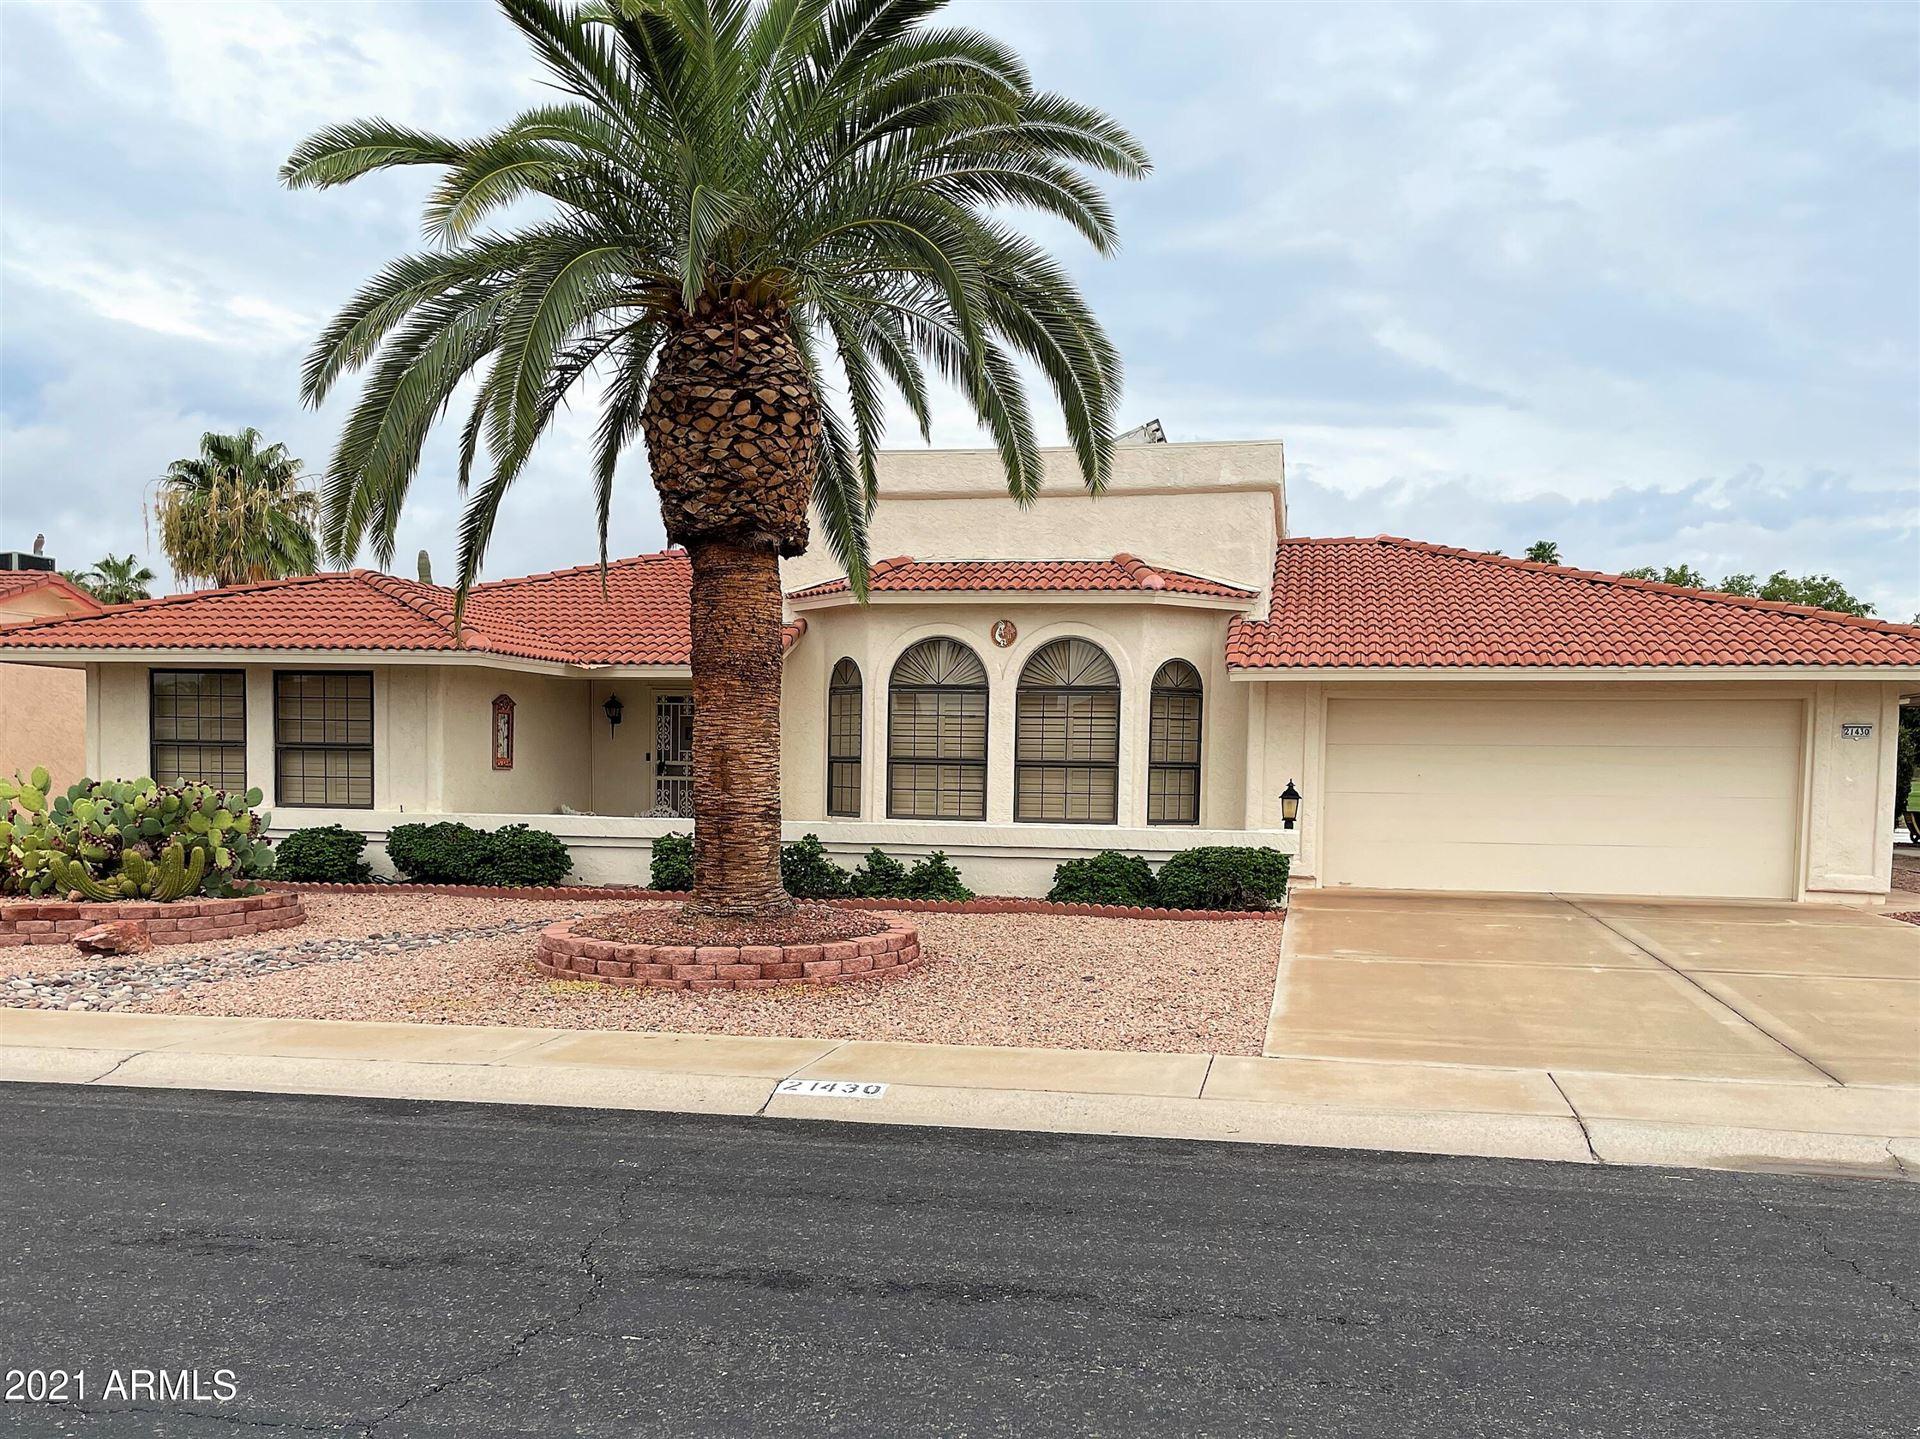 21430 N PALM DESERT Drive, Sun City West, AZ 85375 - MLS#: 6269409